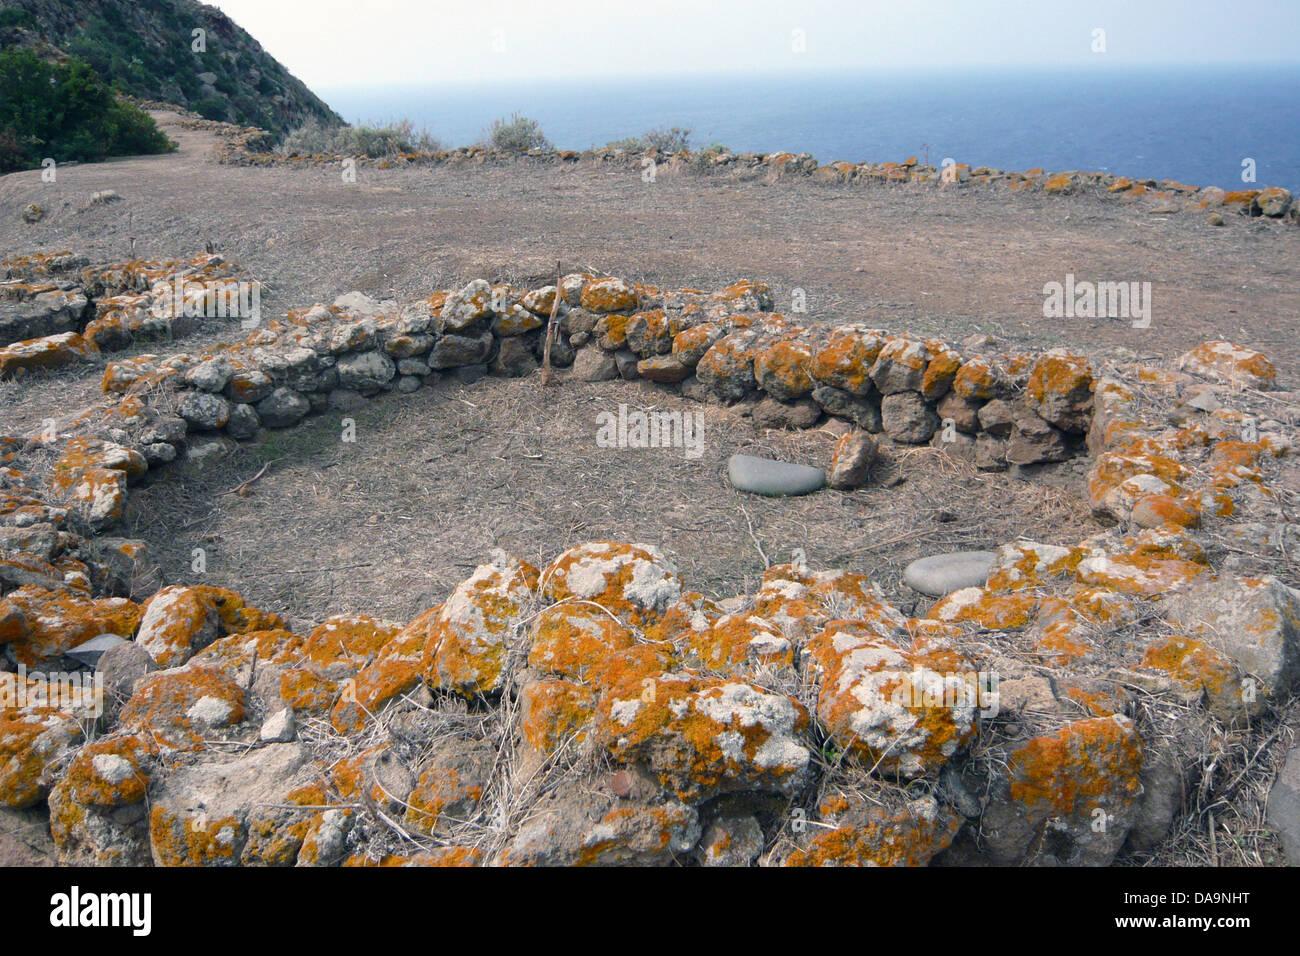 Italy, Europe, Lipari Islands, aeolian, islands, isles, Filicudi, archeology, lichens, excavation, Capo Graziano Stock Photo